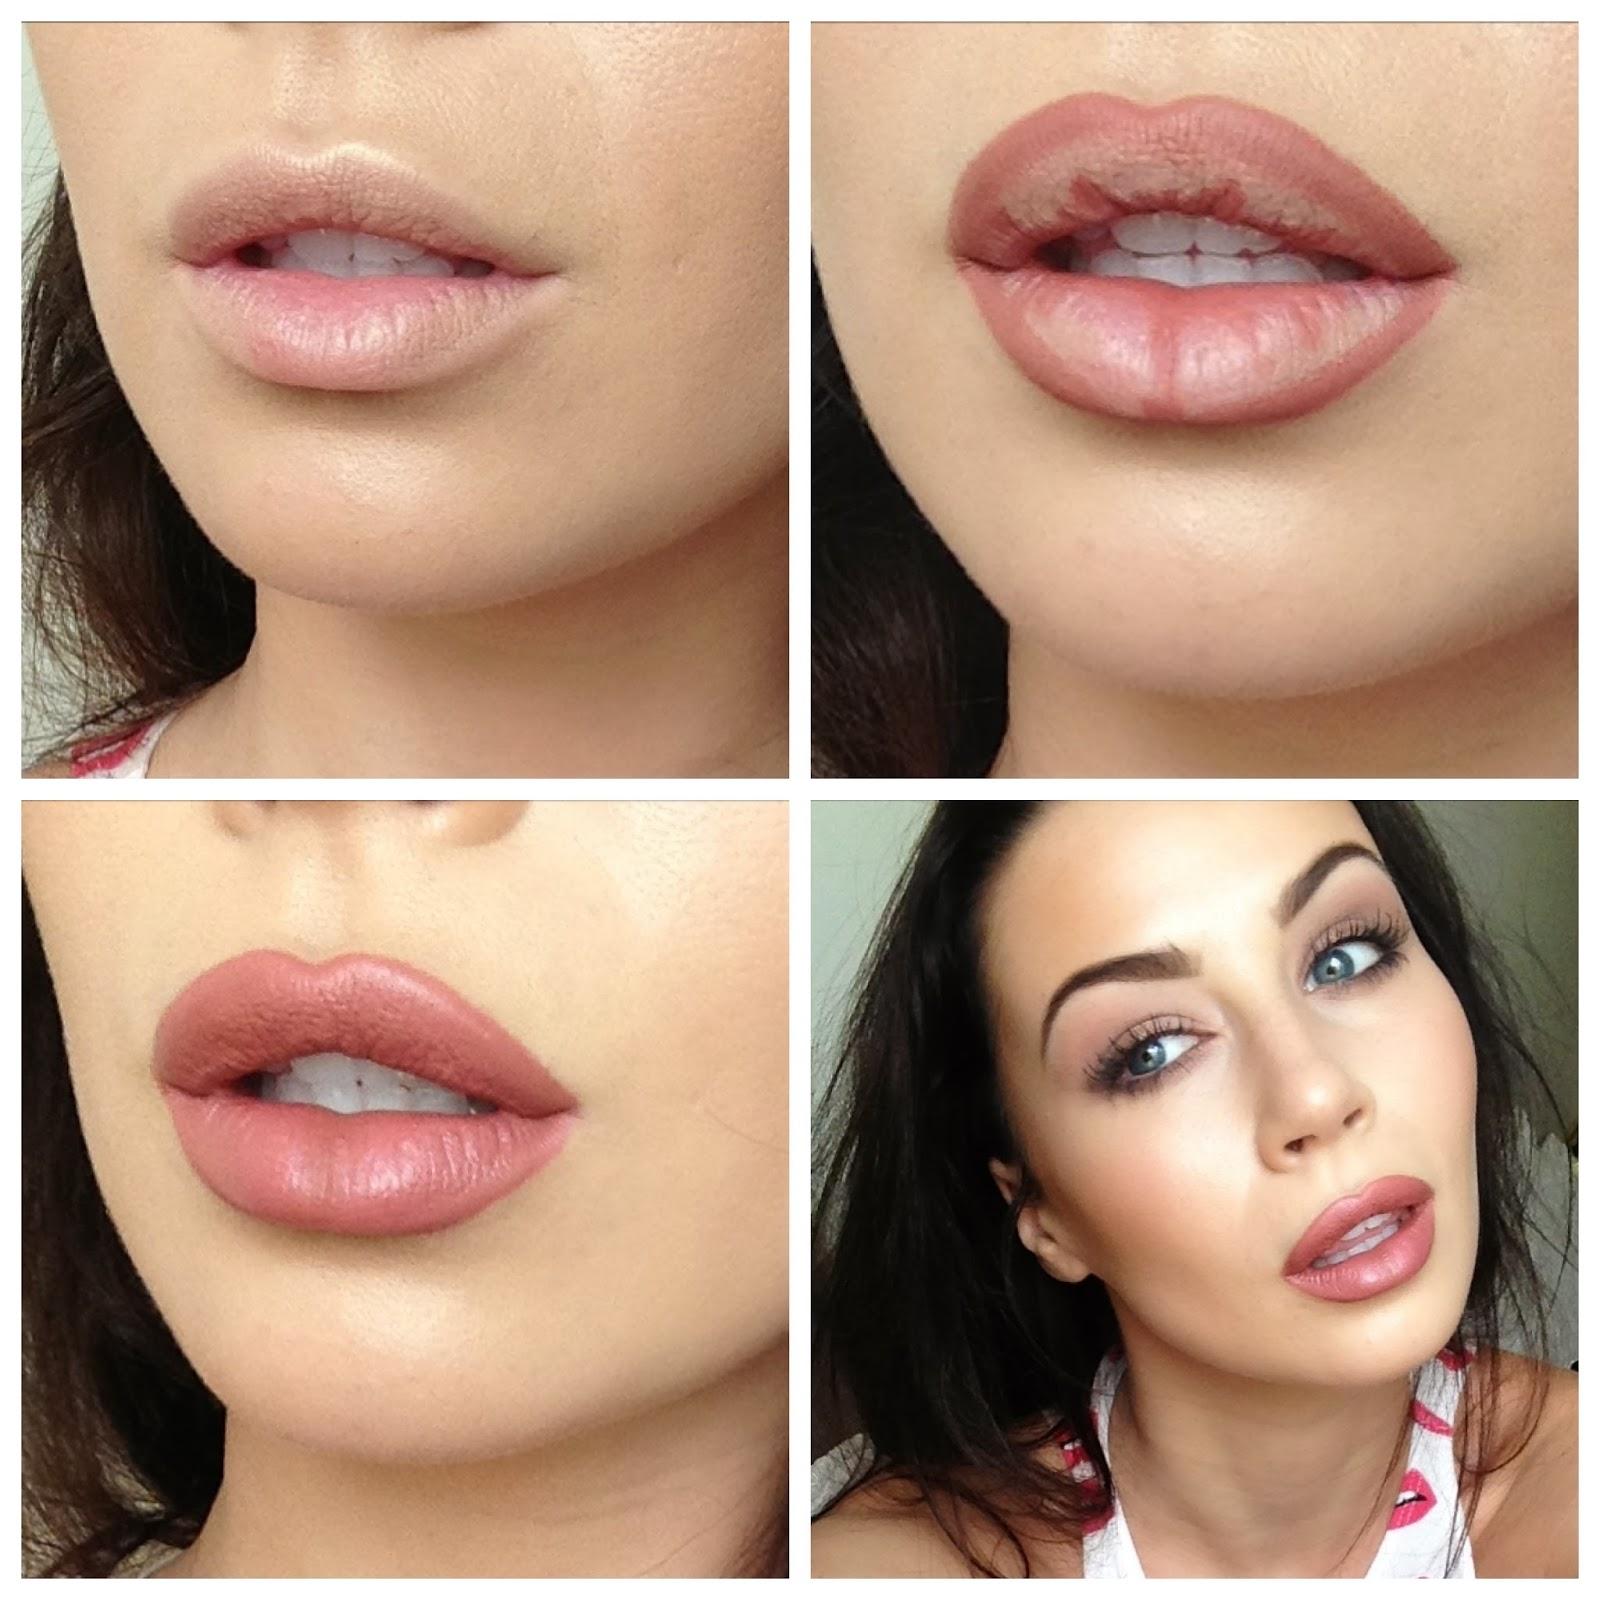 større læber